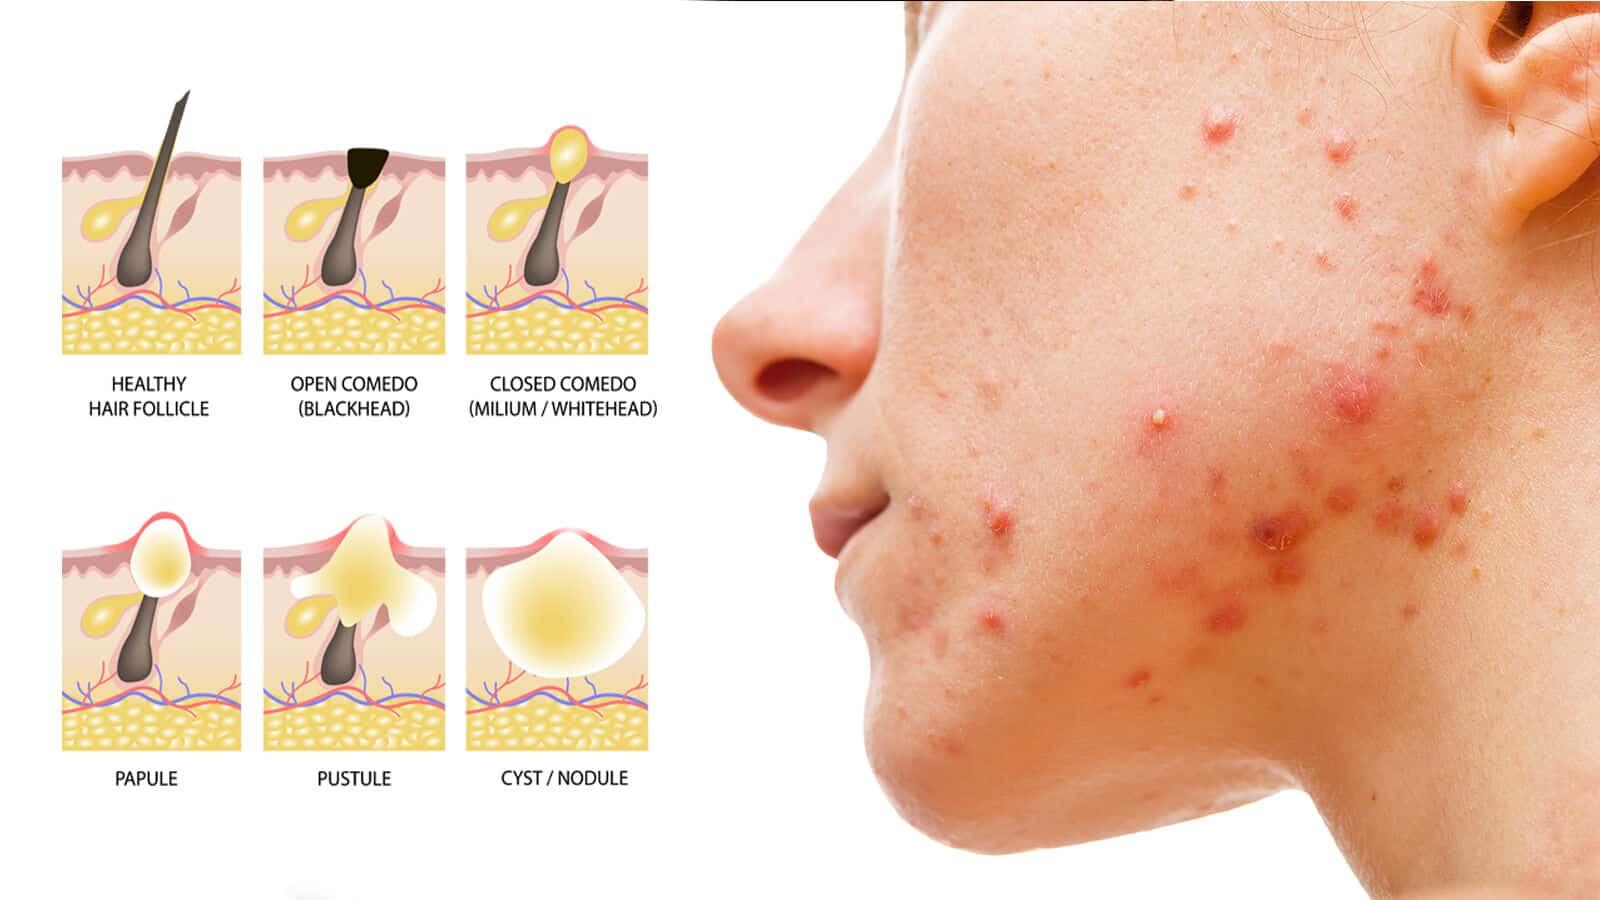 acne prone skin